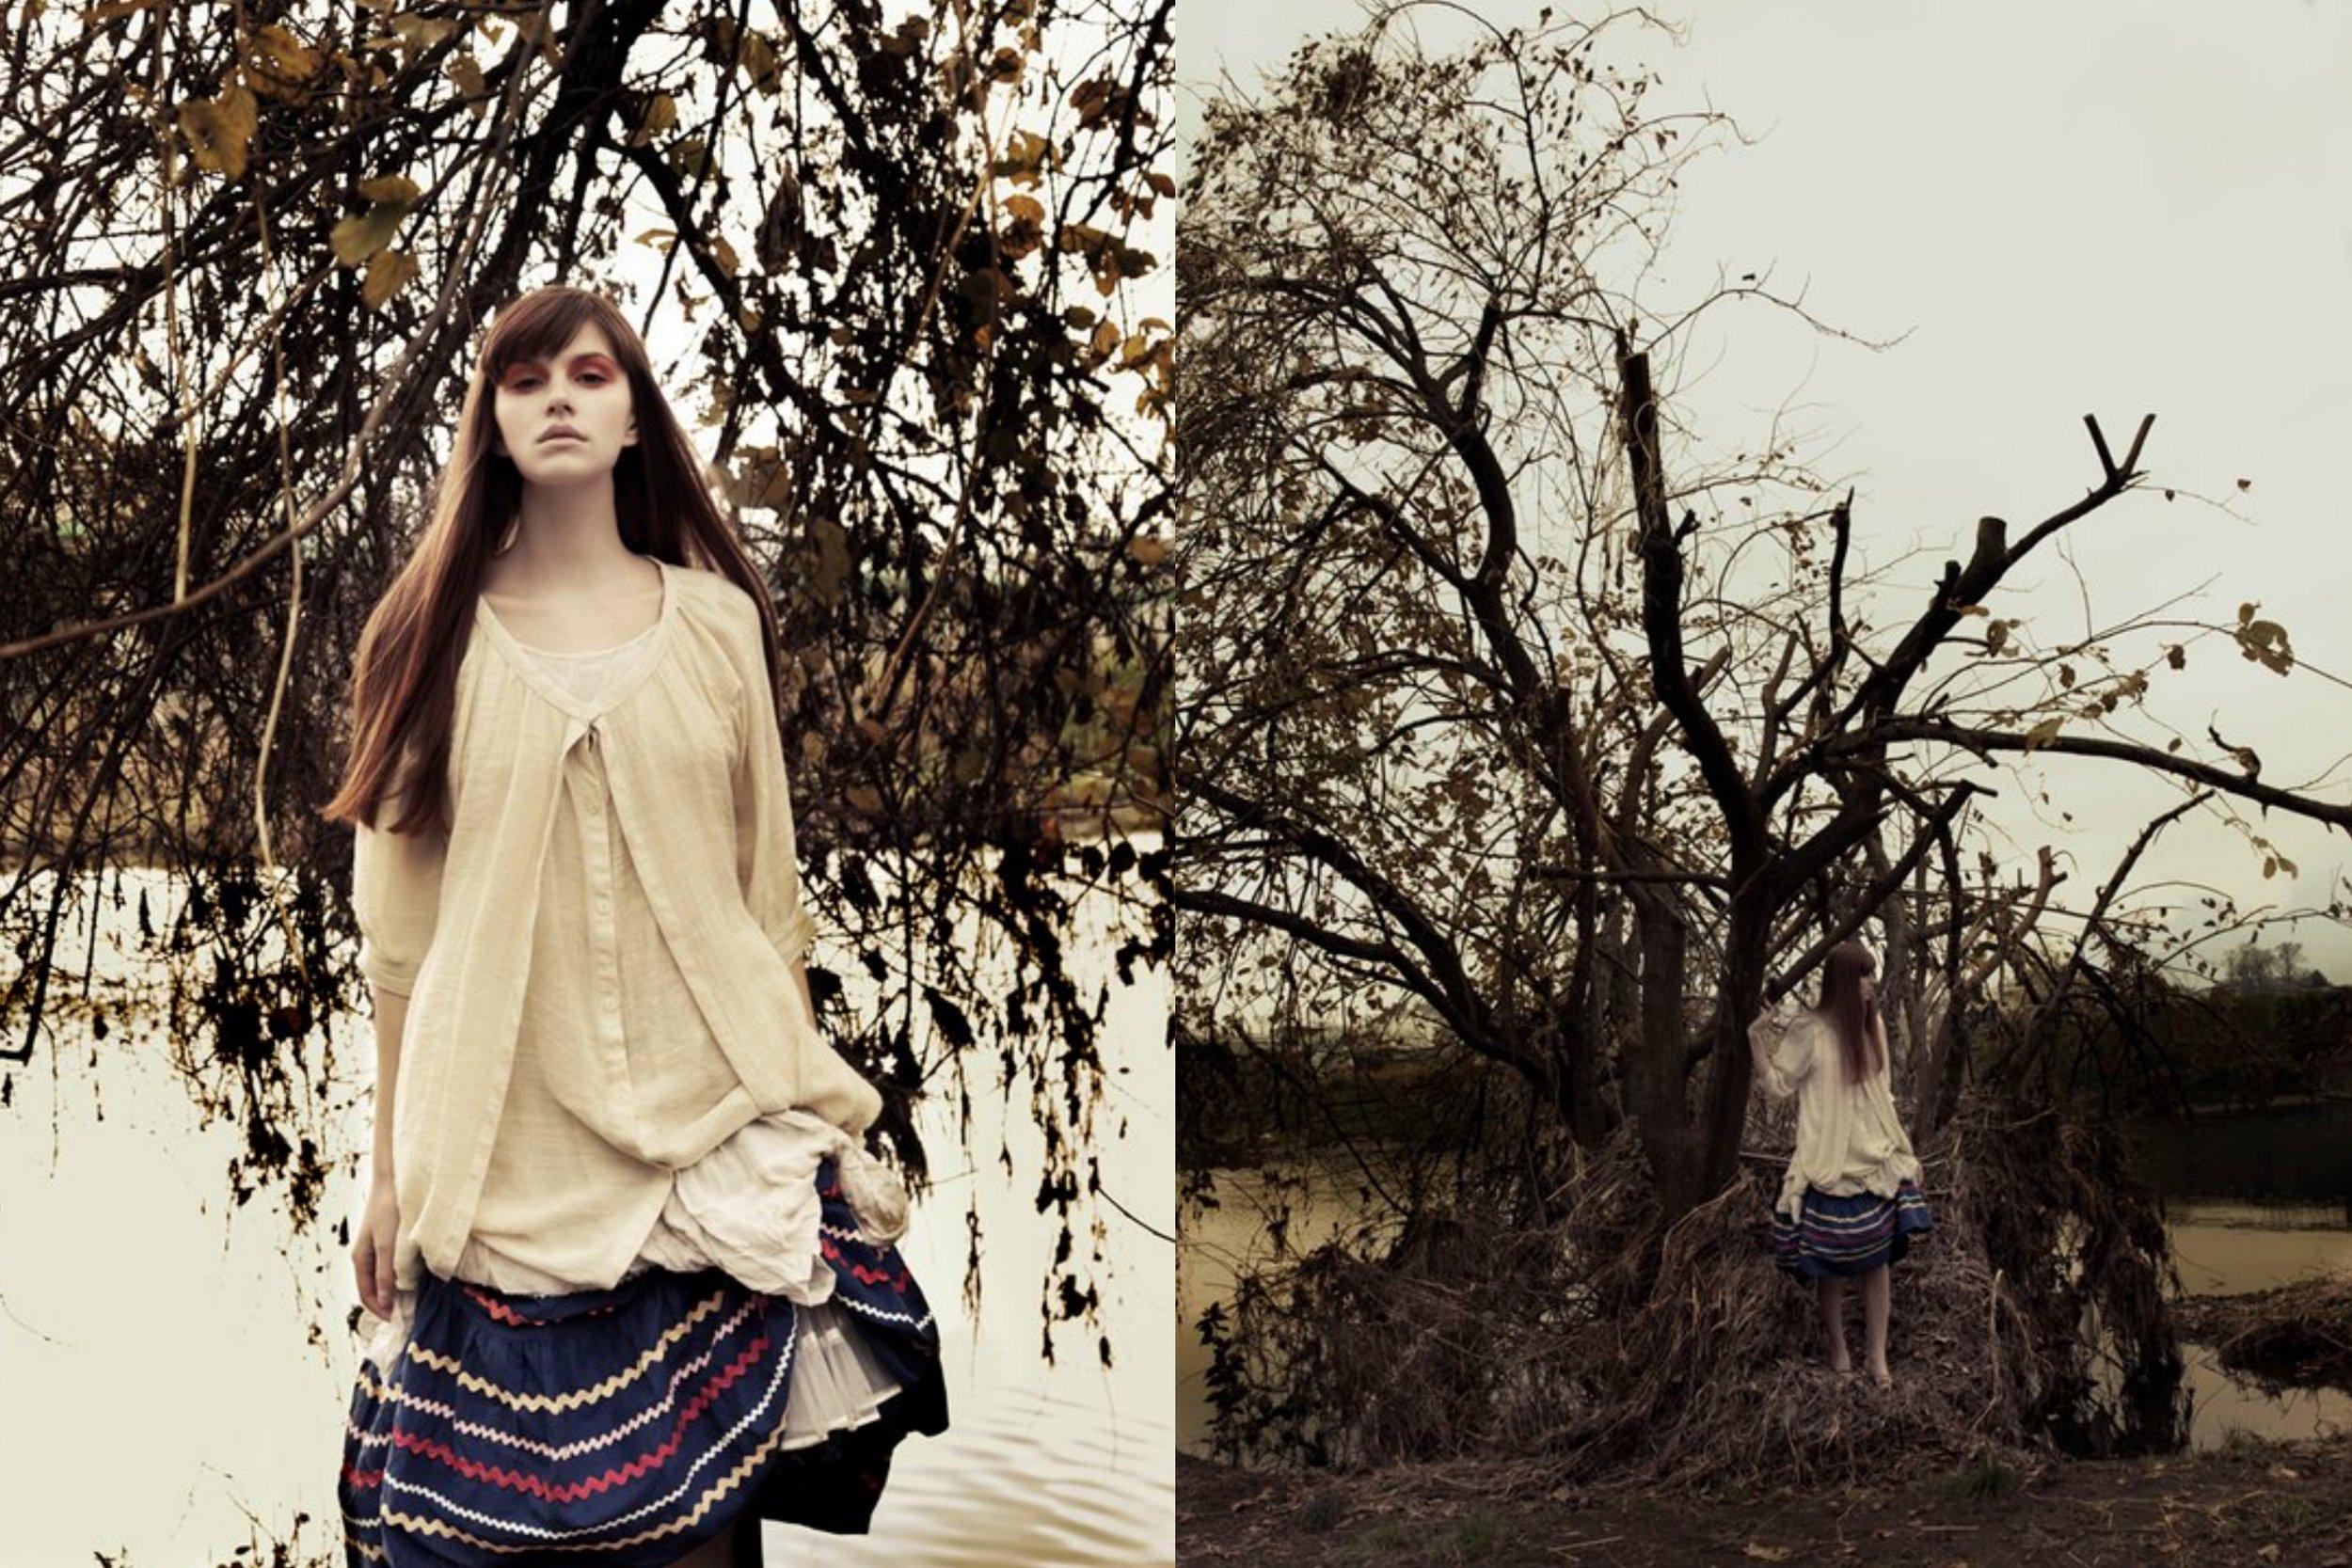 Collage_Fotor koguchi.jpg